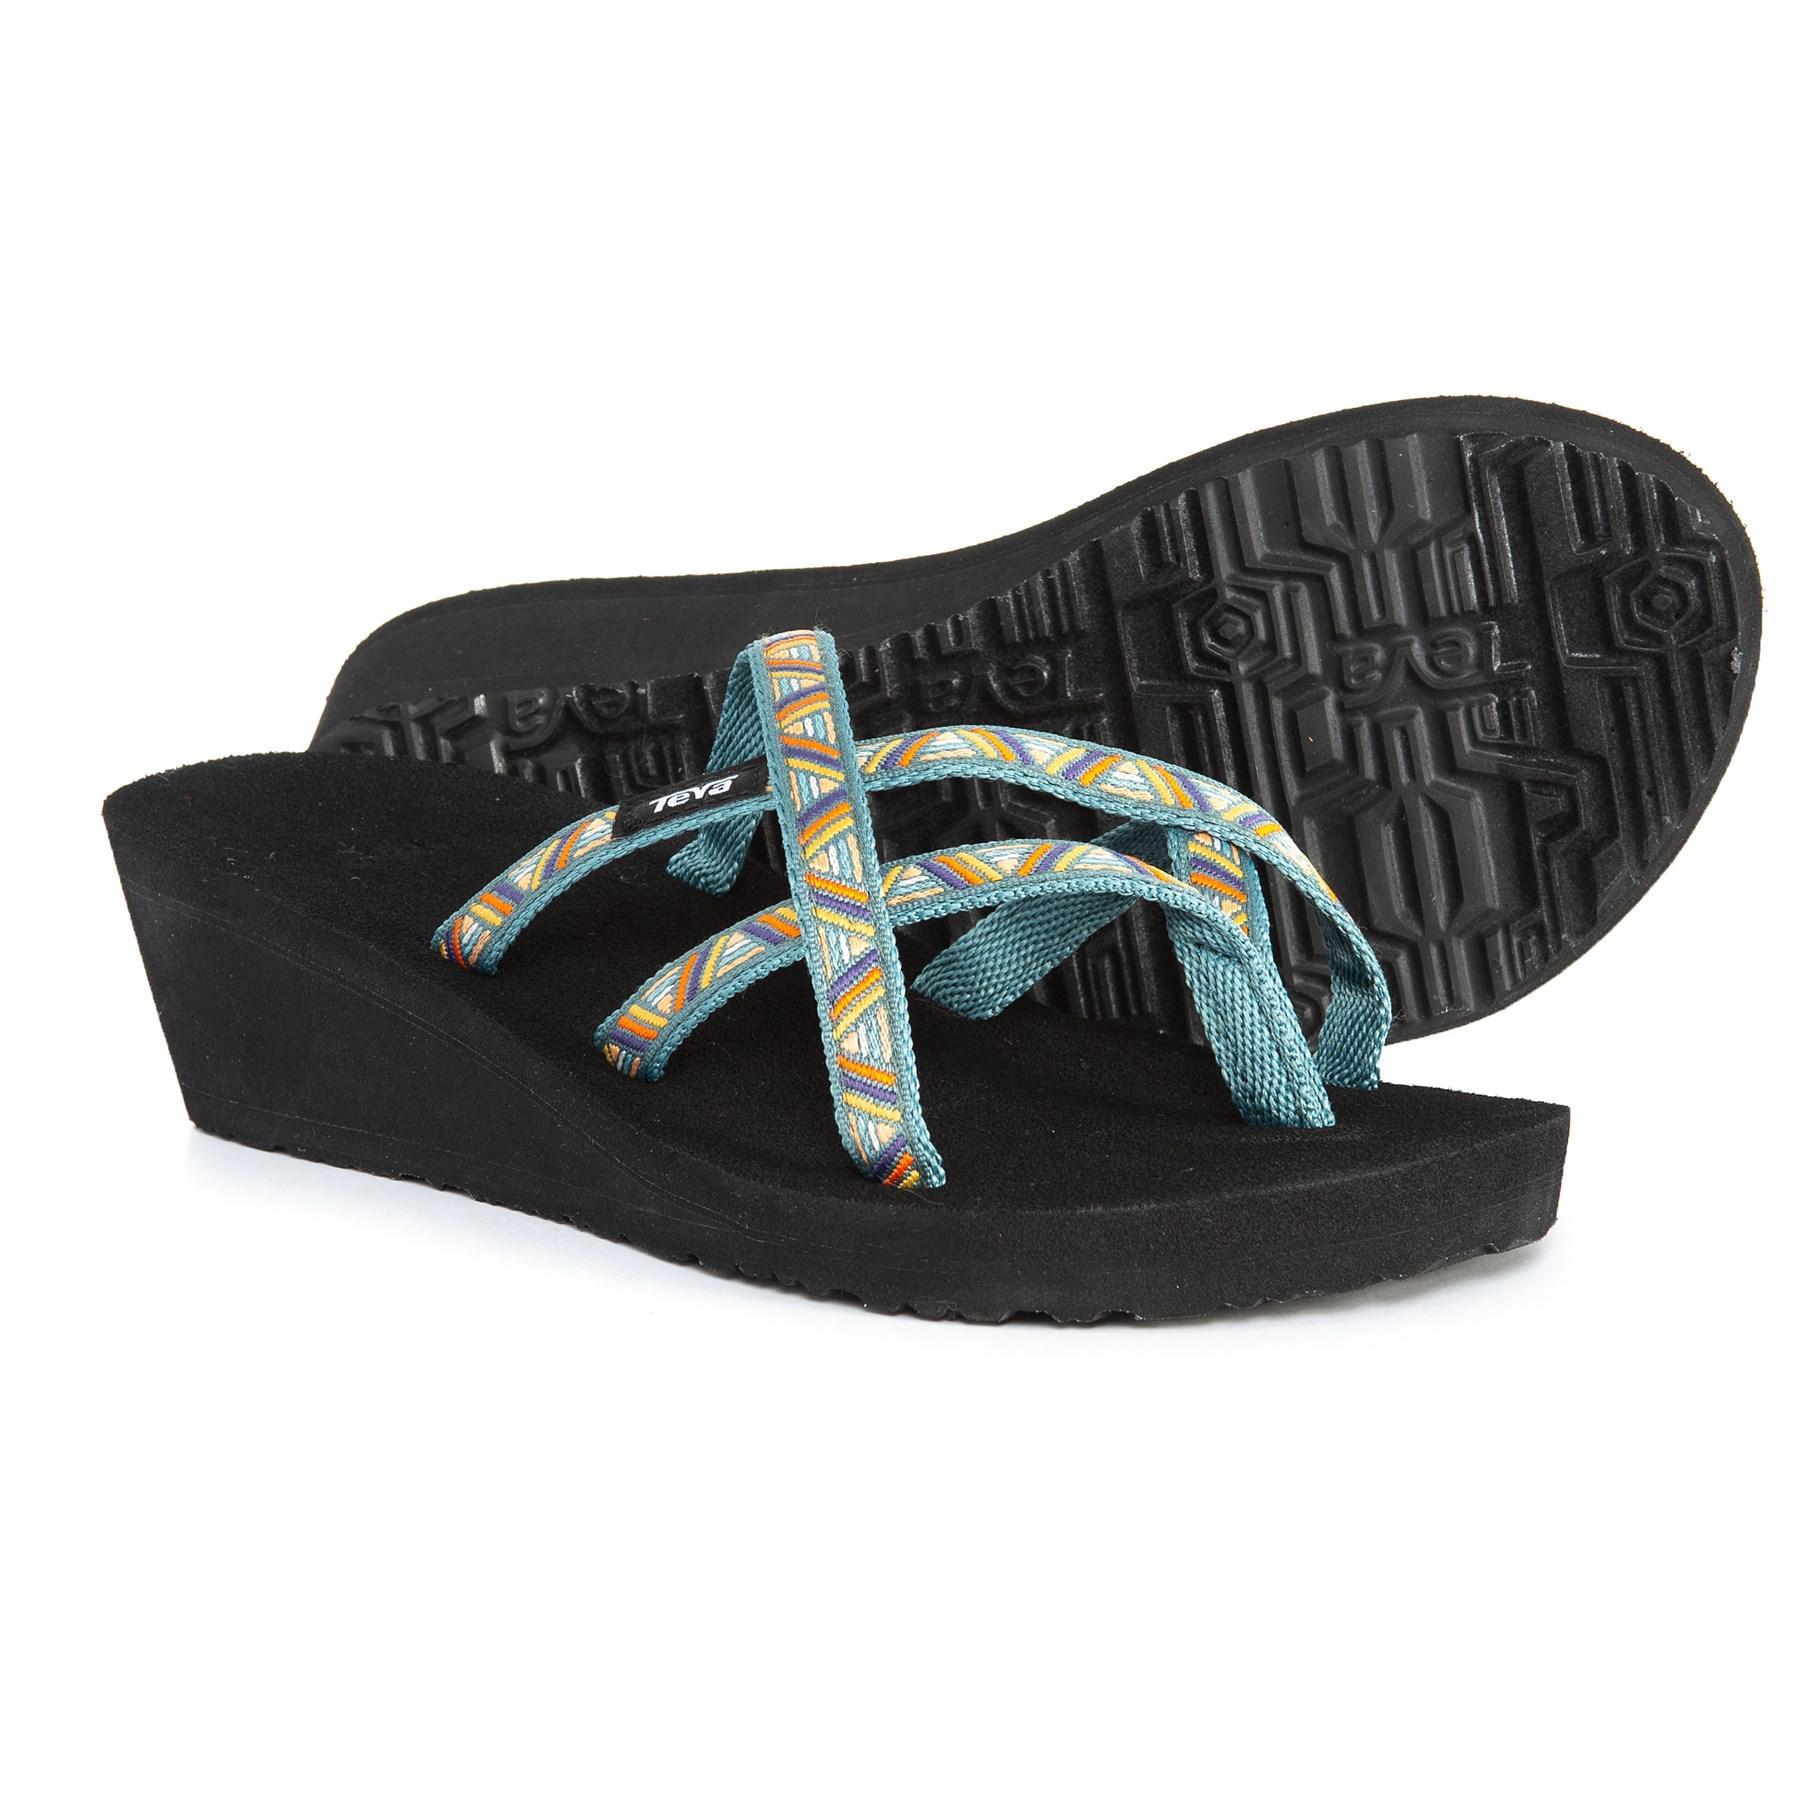 f491ed695 Lyst - Teva Mush® Mandalyn Wedge Ola 2 Sandals (for Women) in Black